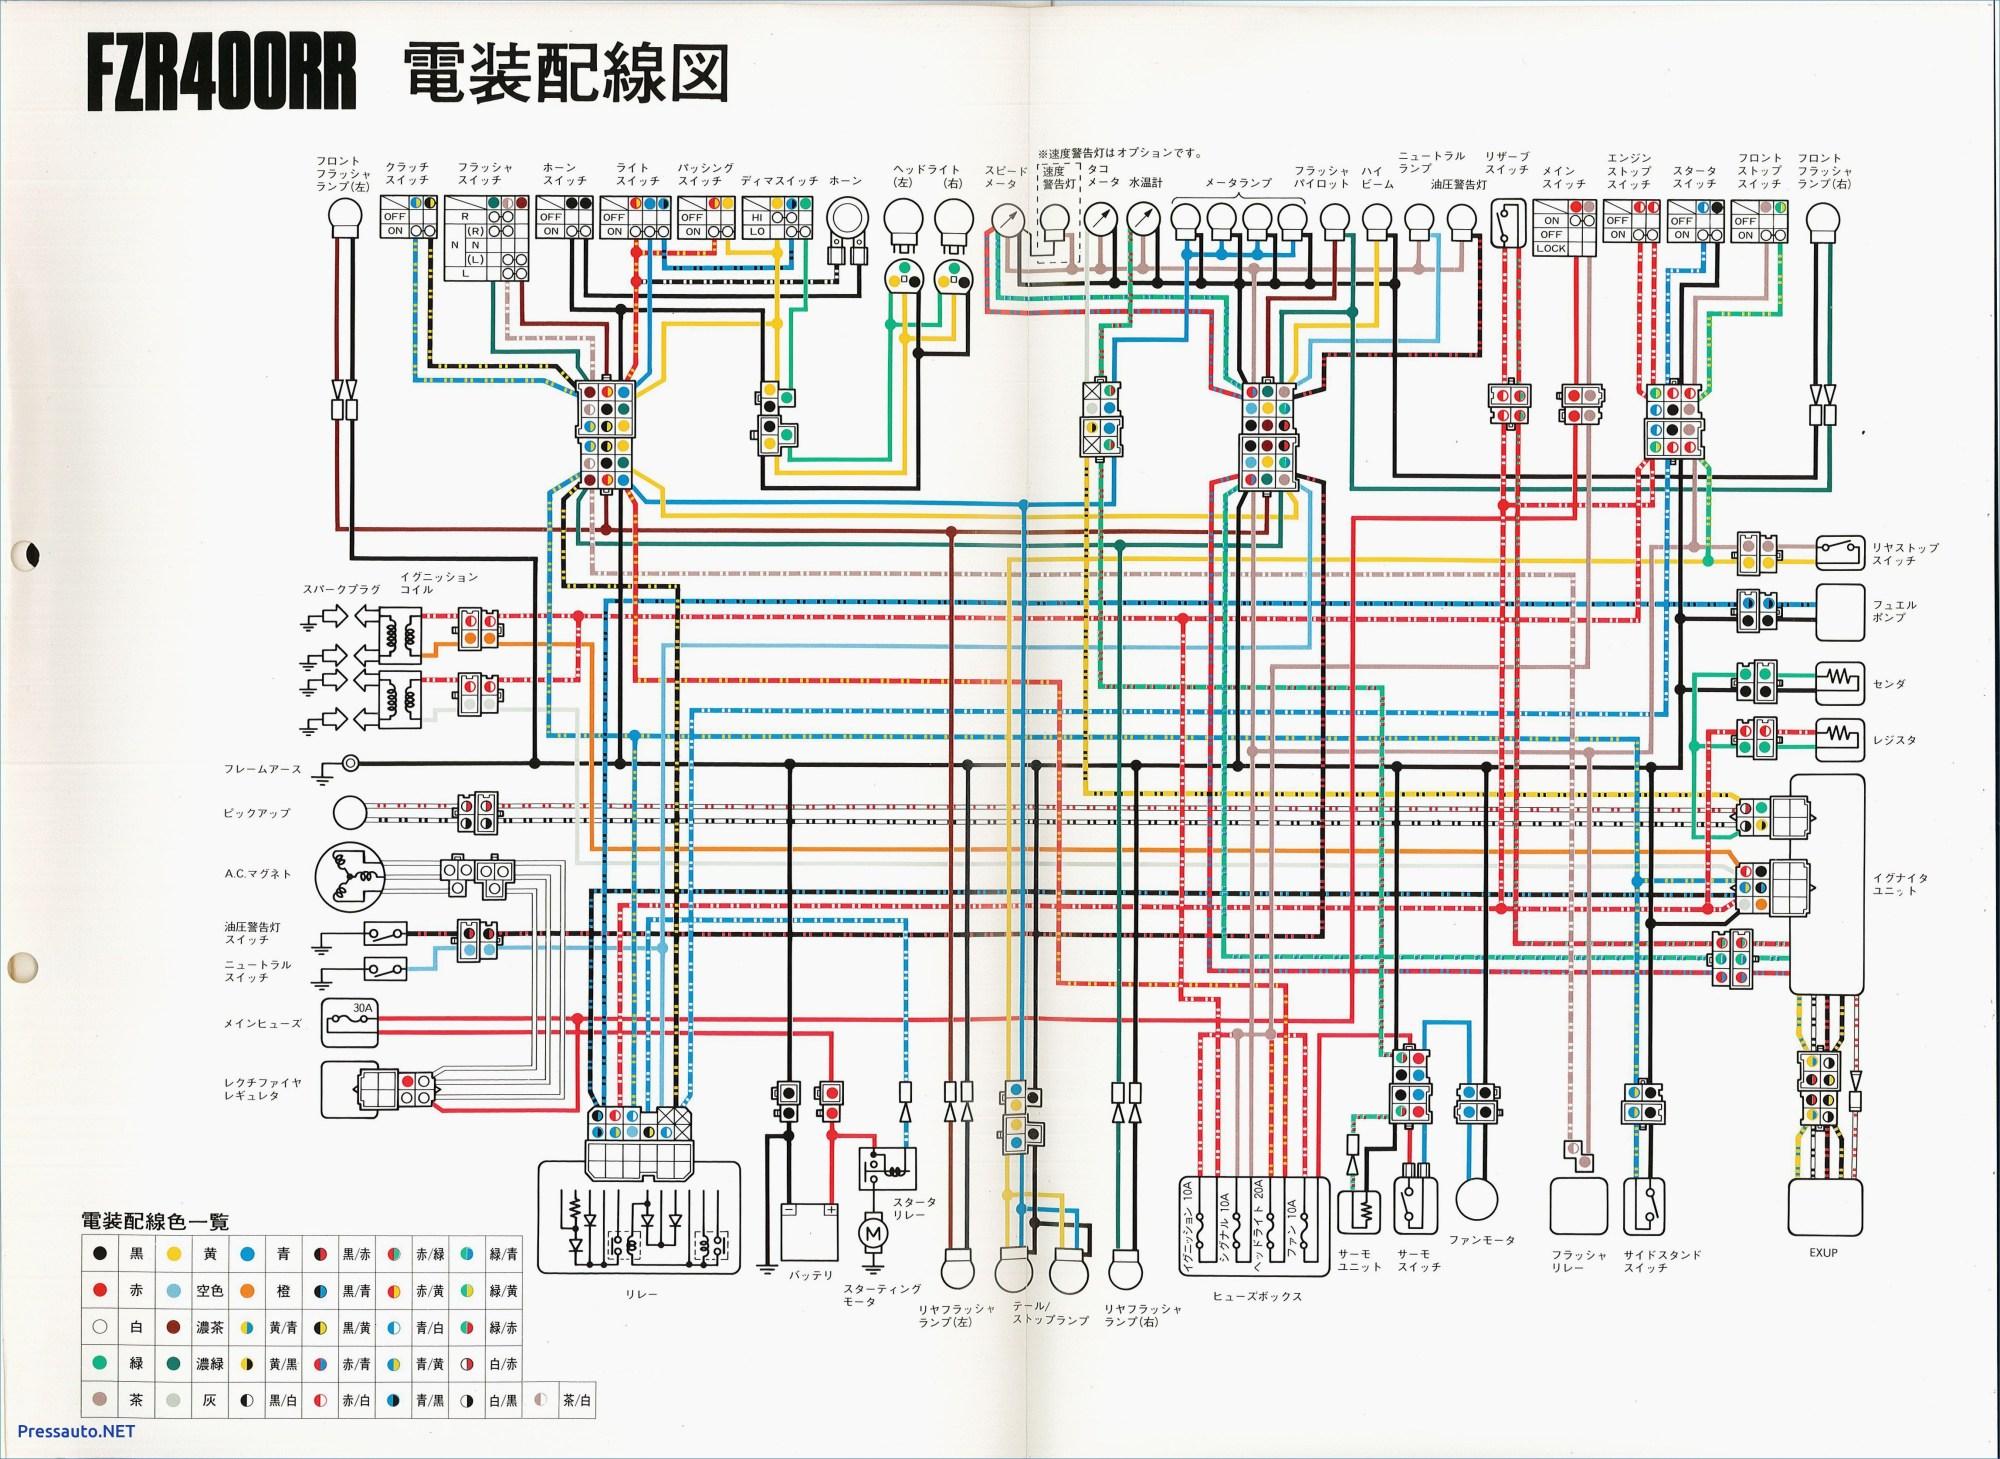 hight resolution of honda foreman 400 parts diagram 07 ltr 450 wiring diagram kubota 3600 power ke and suzuki